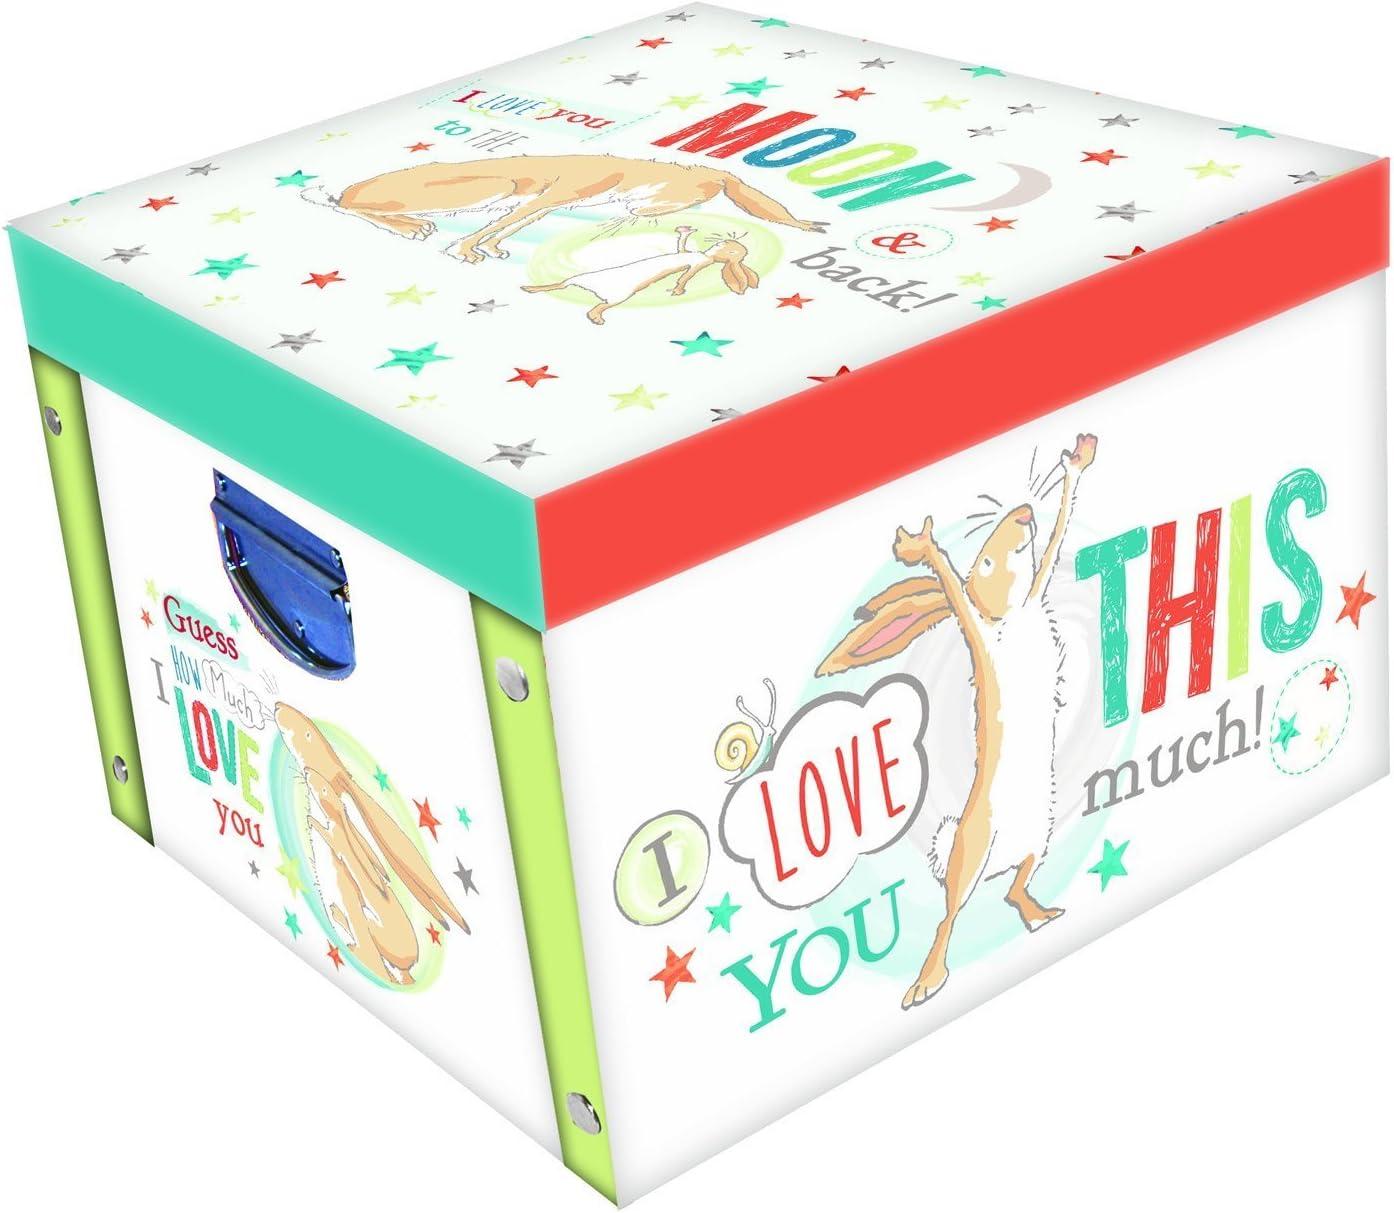 Peter Rabbit Collapsible Storage Box Fold Storage Box Store Kids Cloth Book Toys